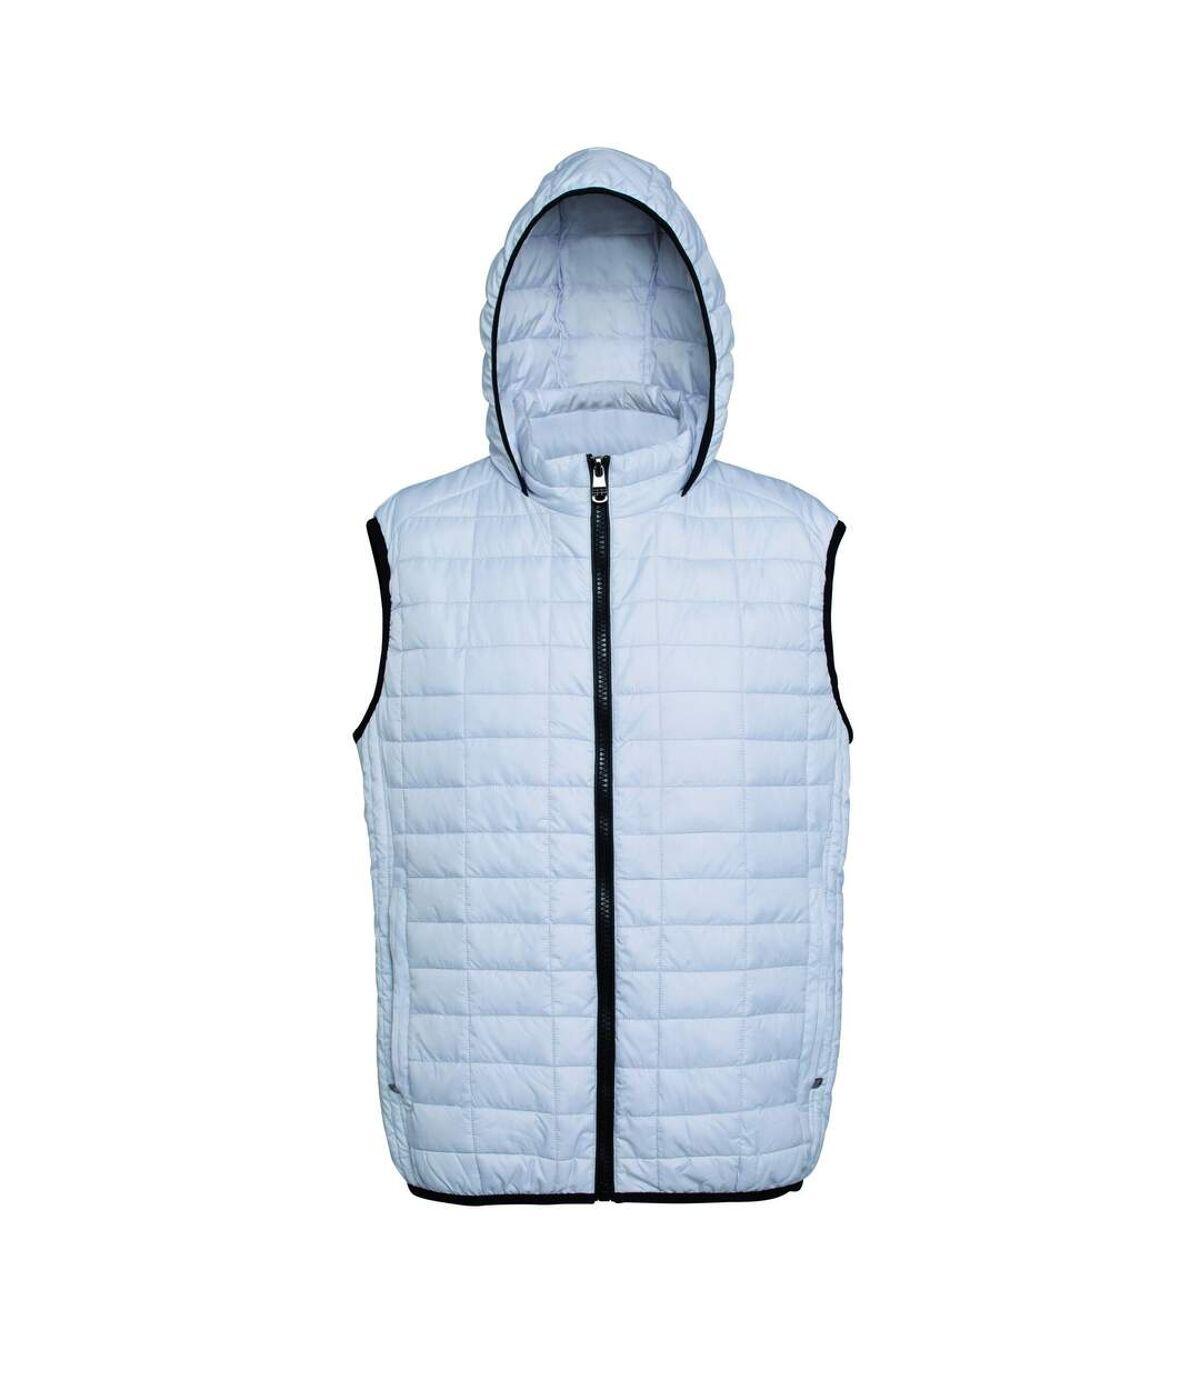 2786 Mens Honeycomb Zip Up Hooded Gilet/Bodywarmer (Black) - UTRW5261